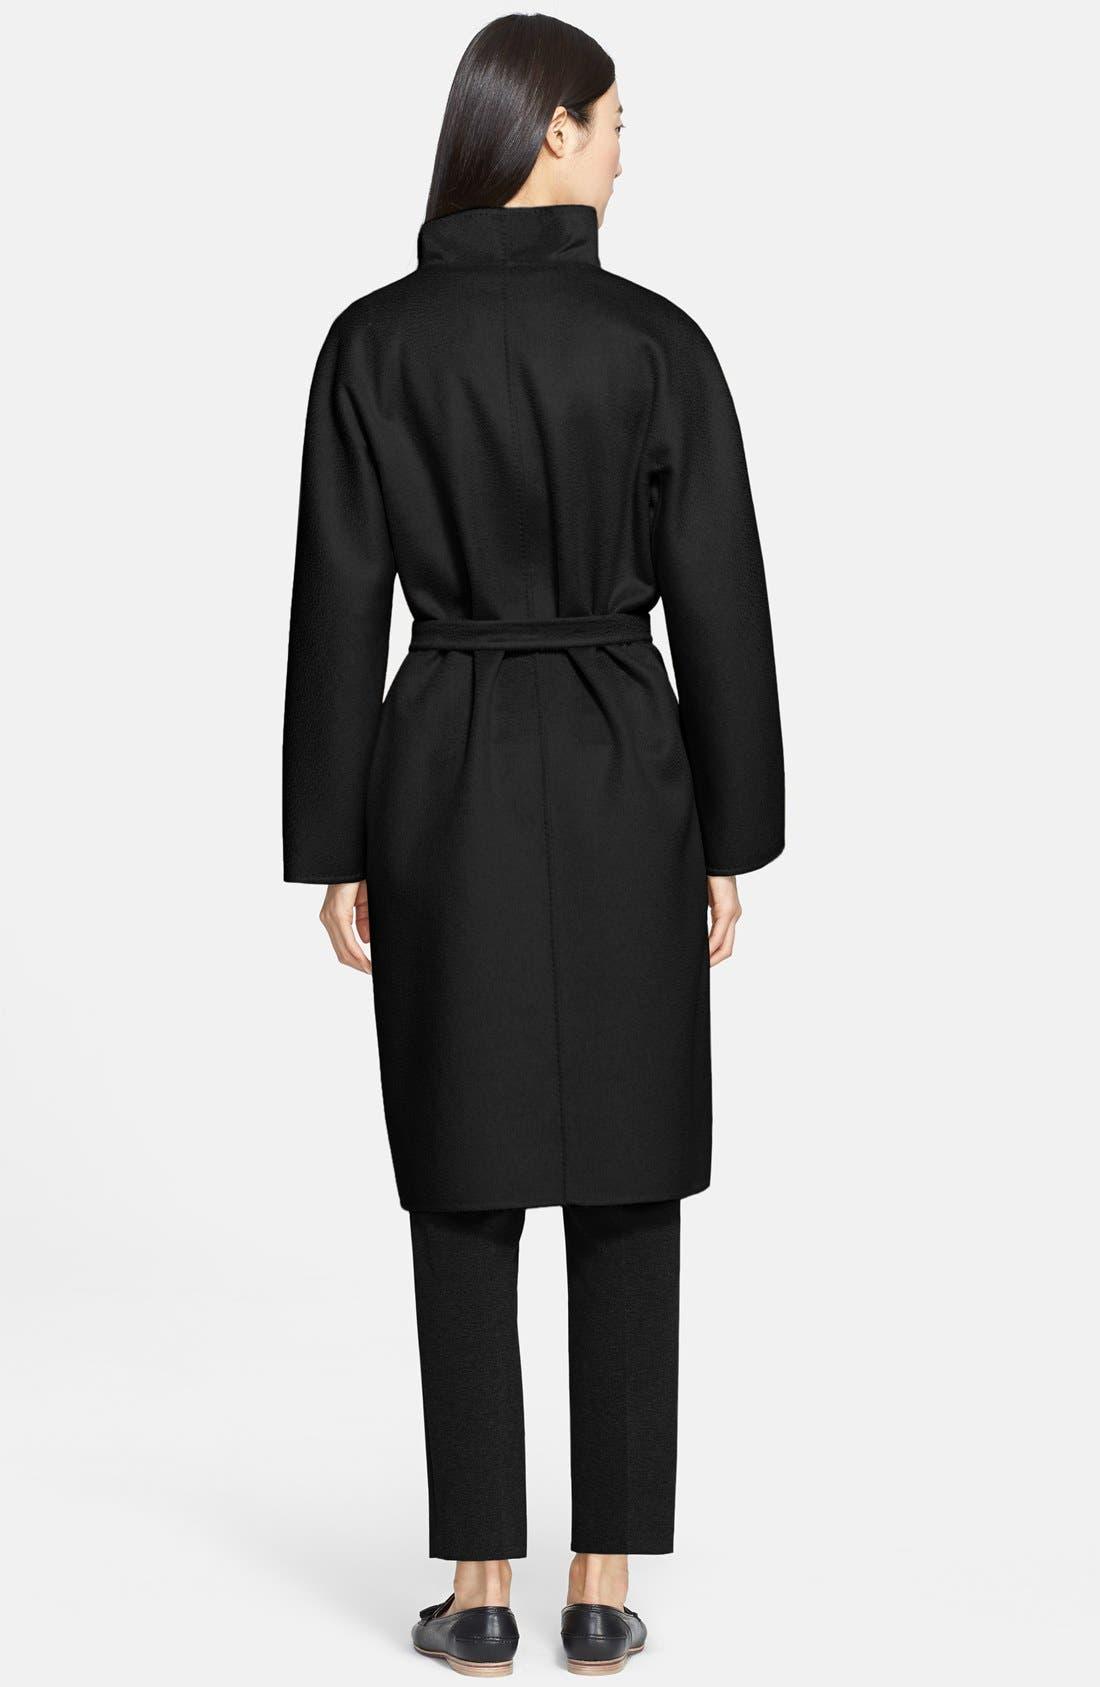 MAX MARA,                             'Lilia' Belted Cashmere Coat,                             Alternate thumbnail 3, color,                             001